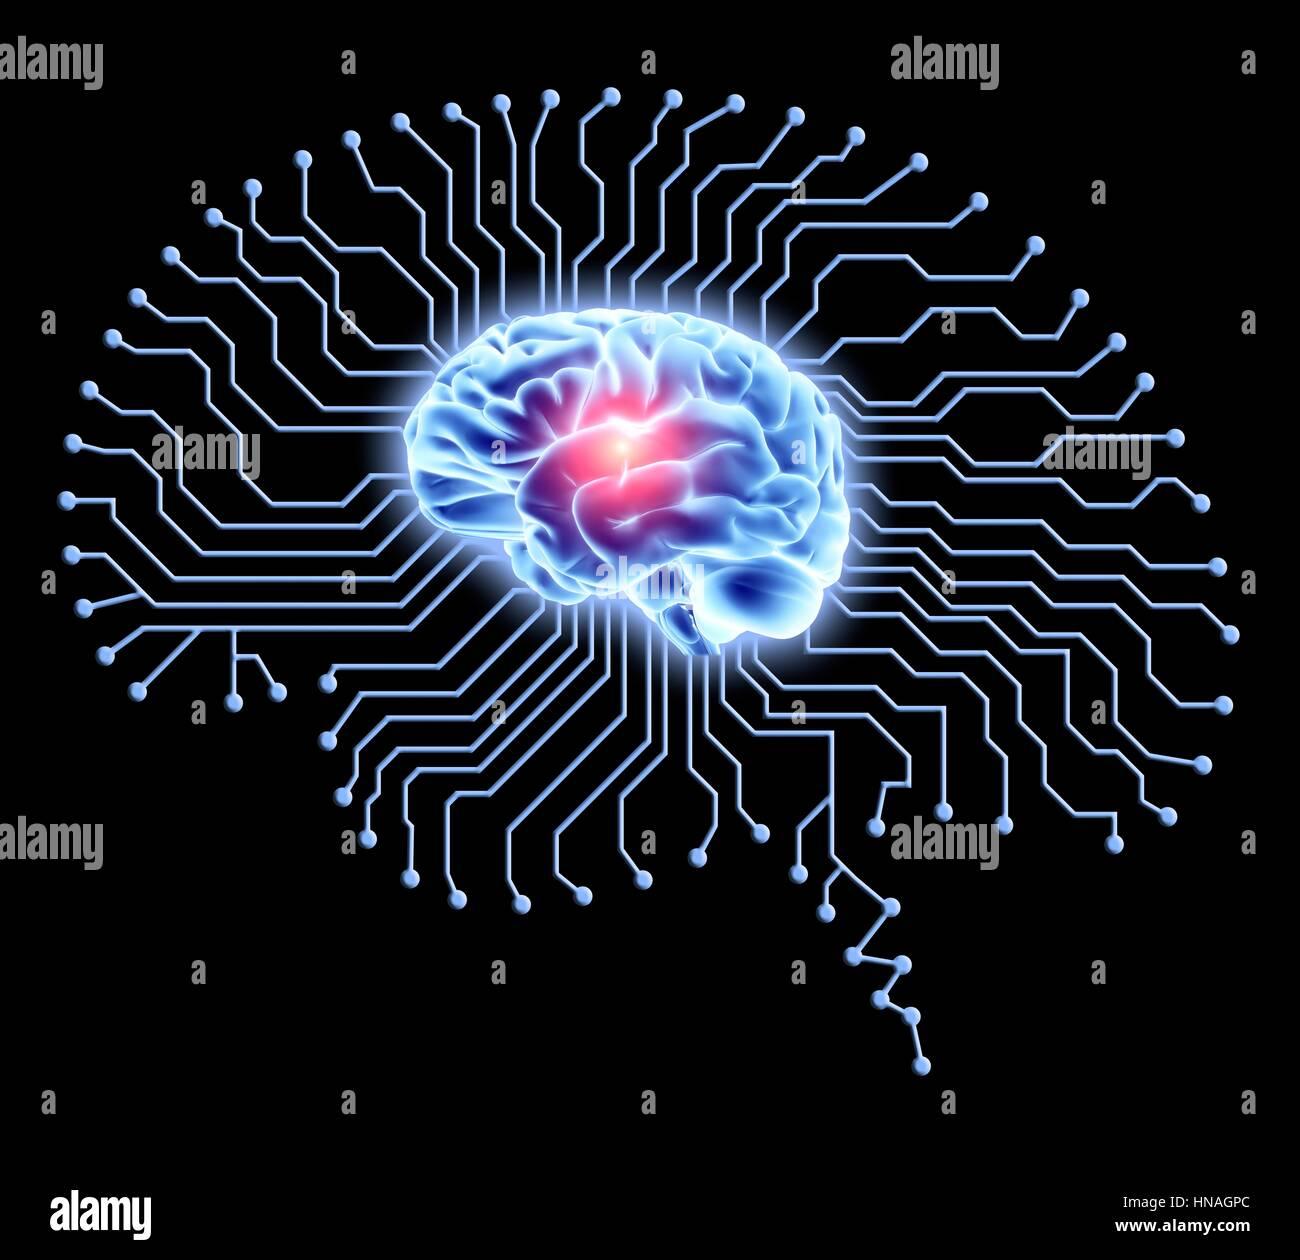 Human brain on brain-shaped printed circuit board. Conceptual Stock ...